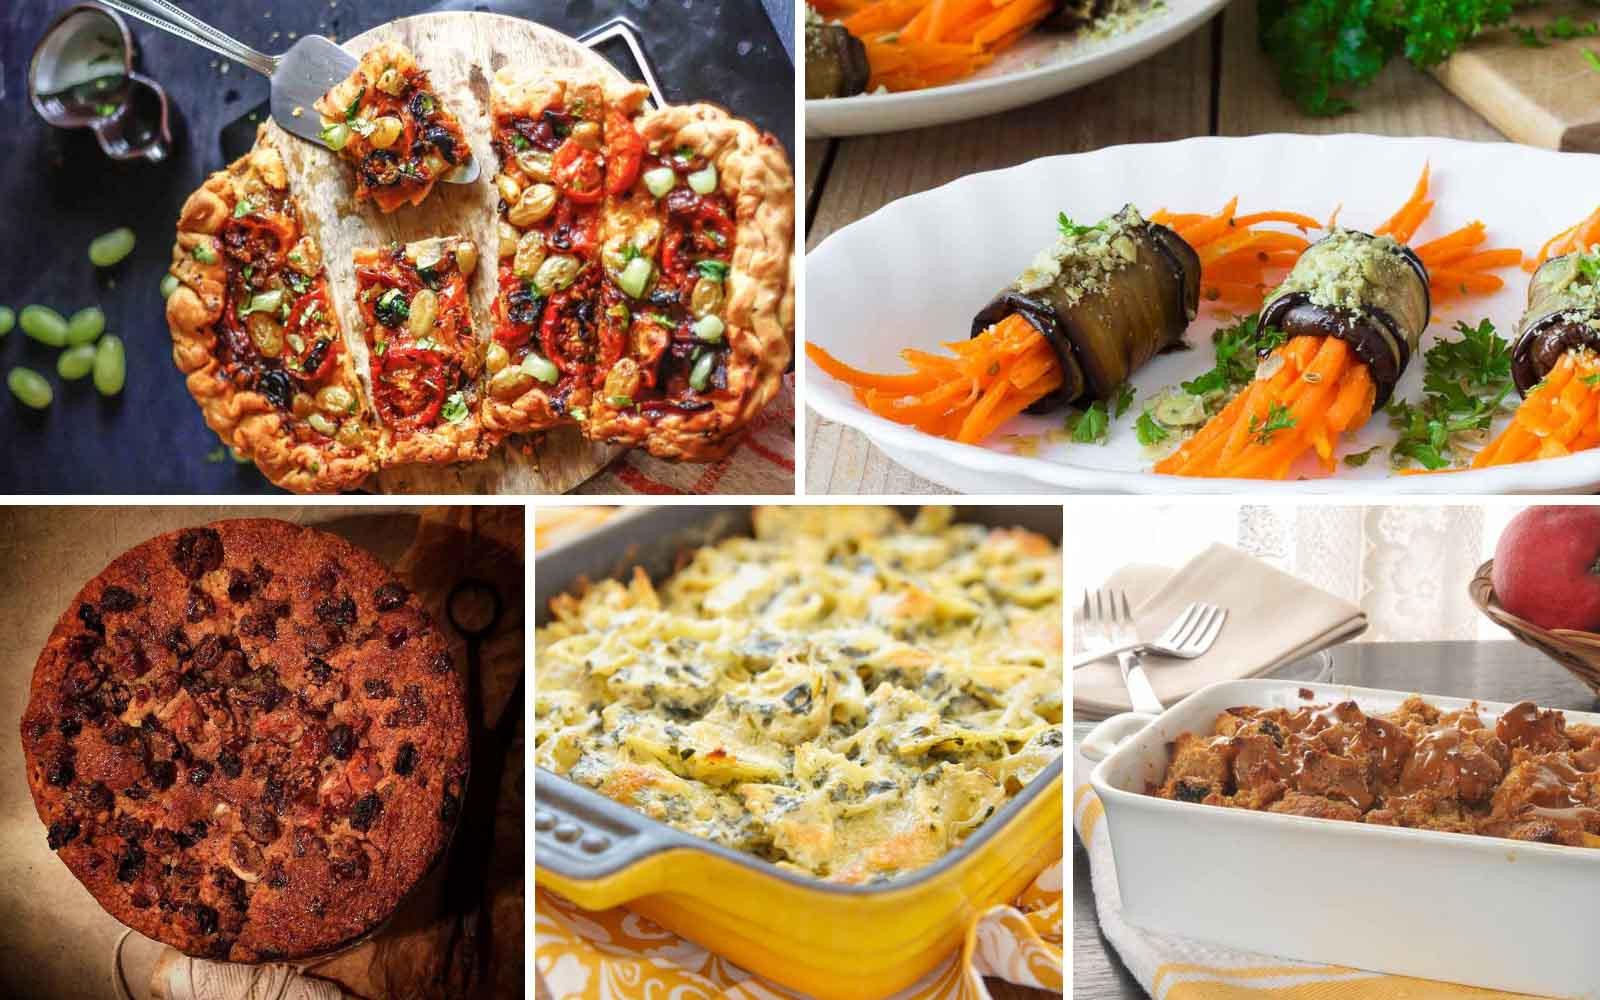 Vegetarian Christmas Dinner  Enjoy A 3 Course Ve arian Christmas Dinner Menu by